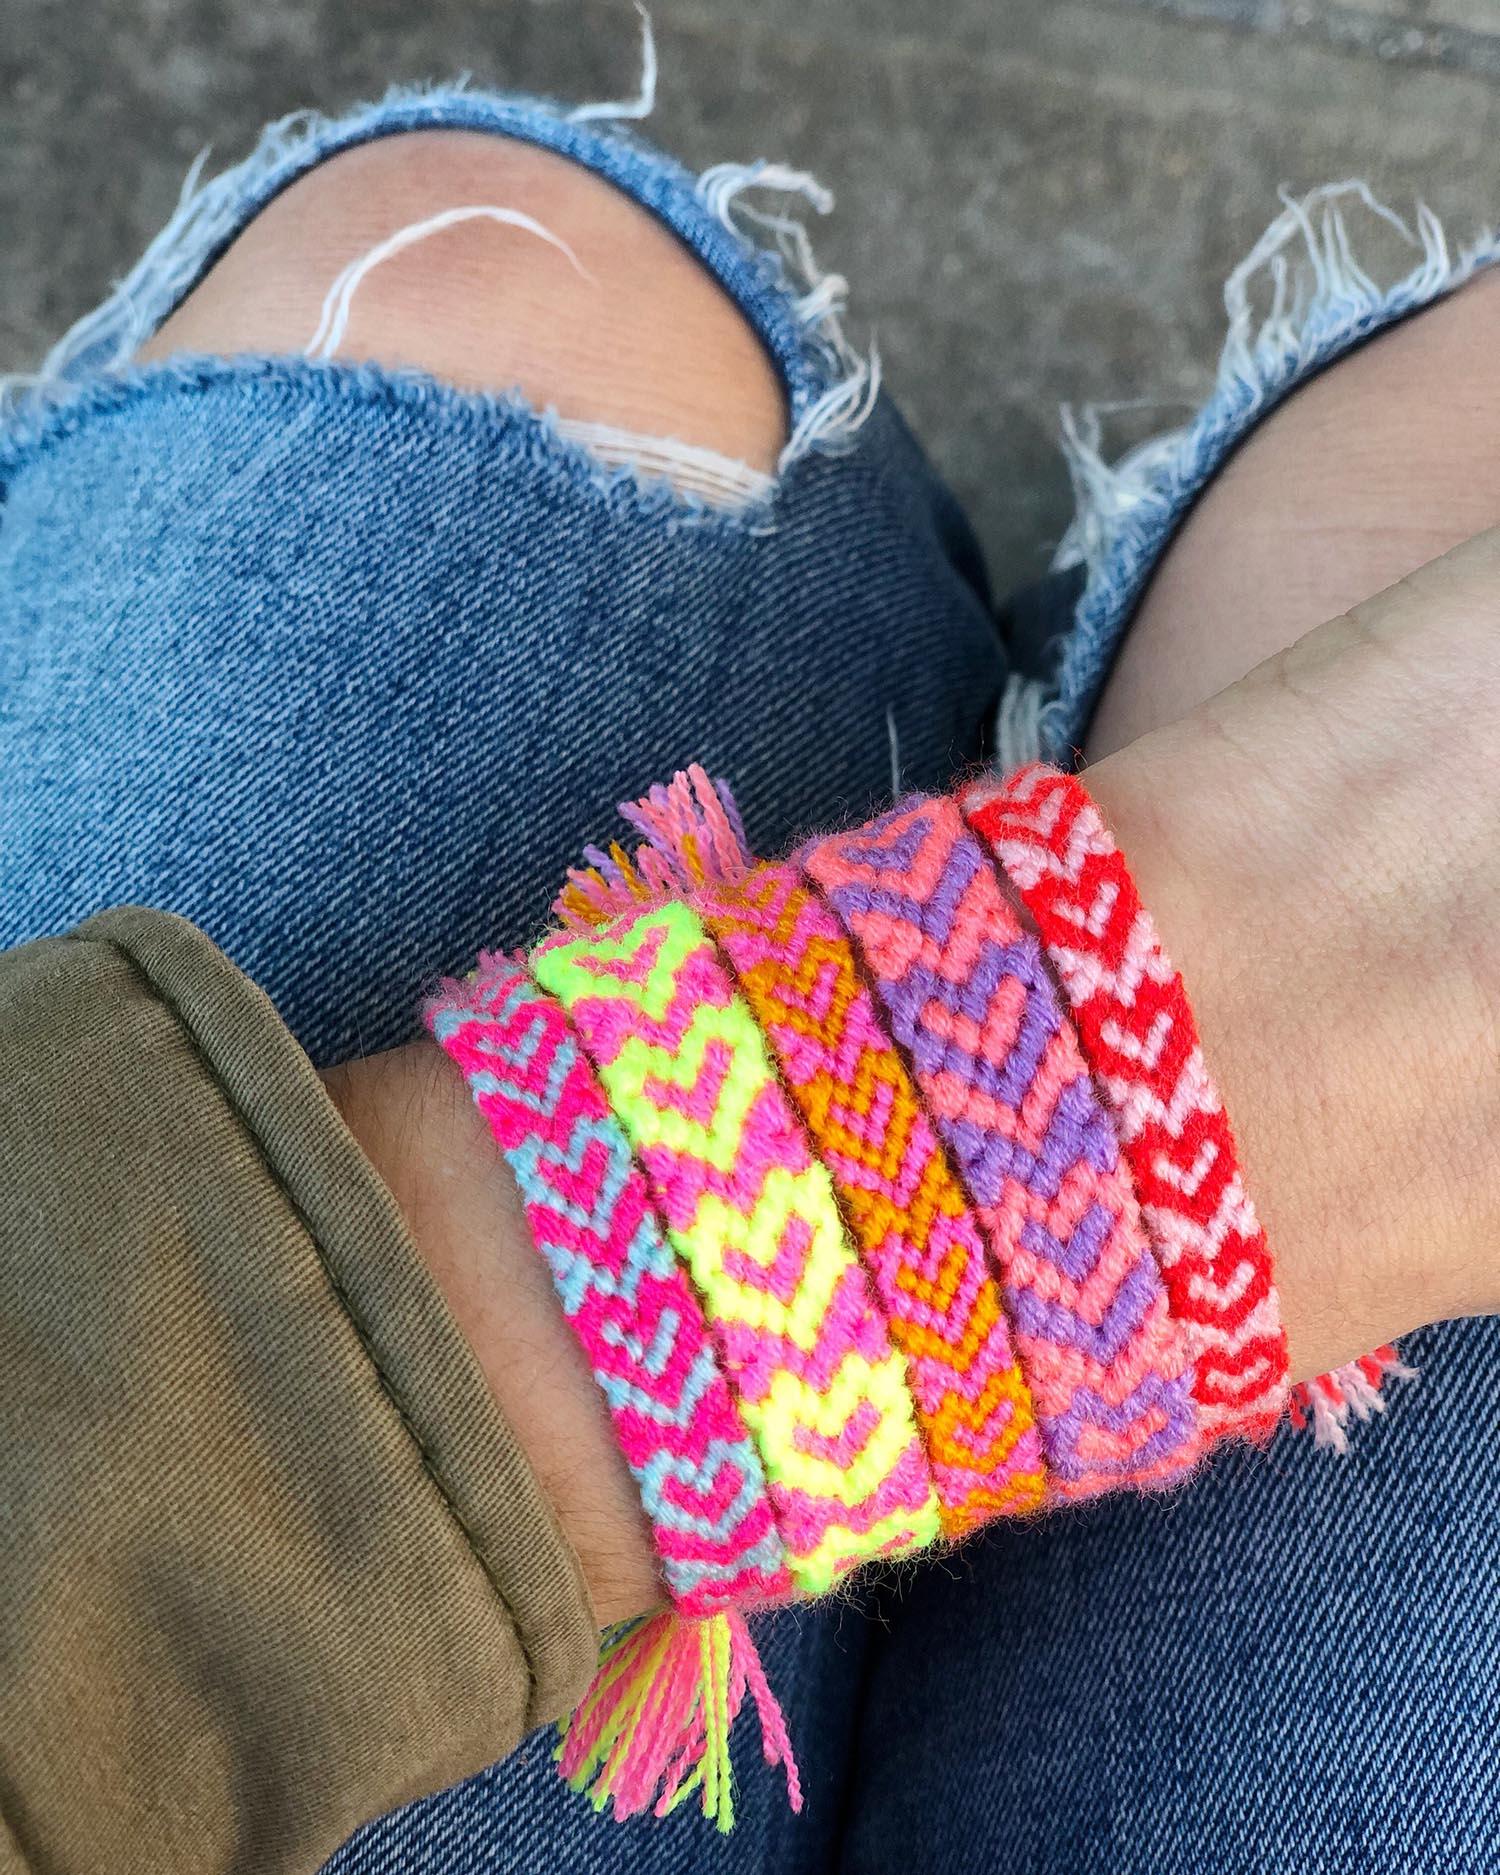 How To Prep Finish Friendship Bracelets